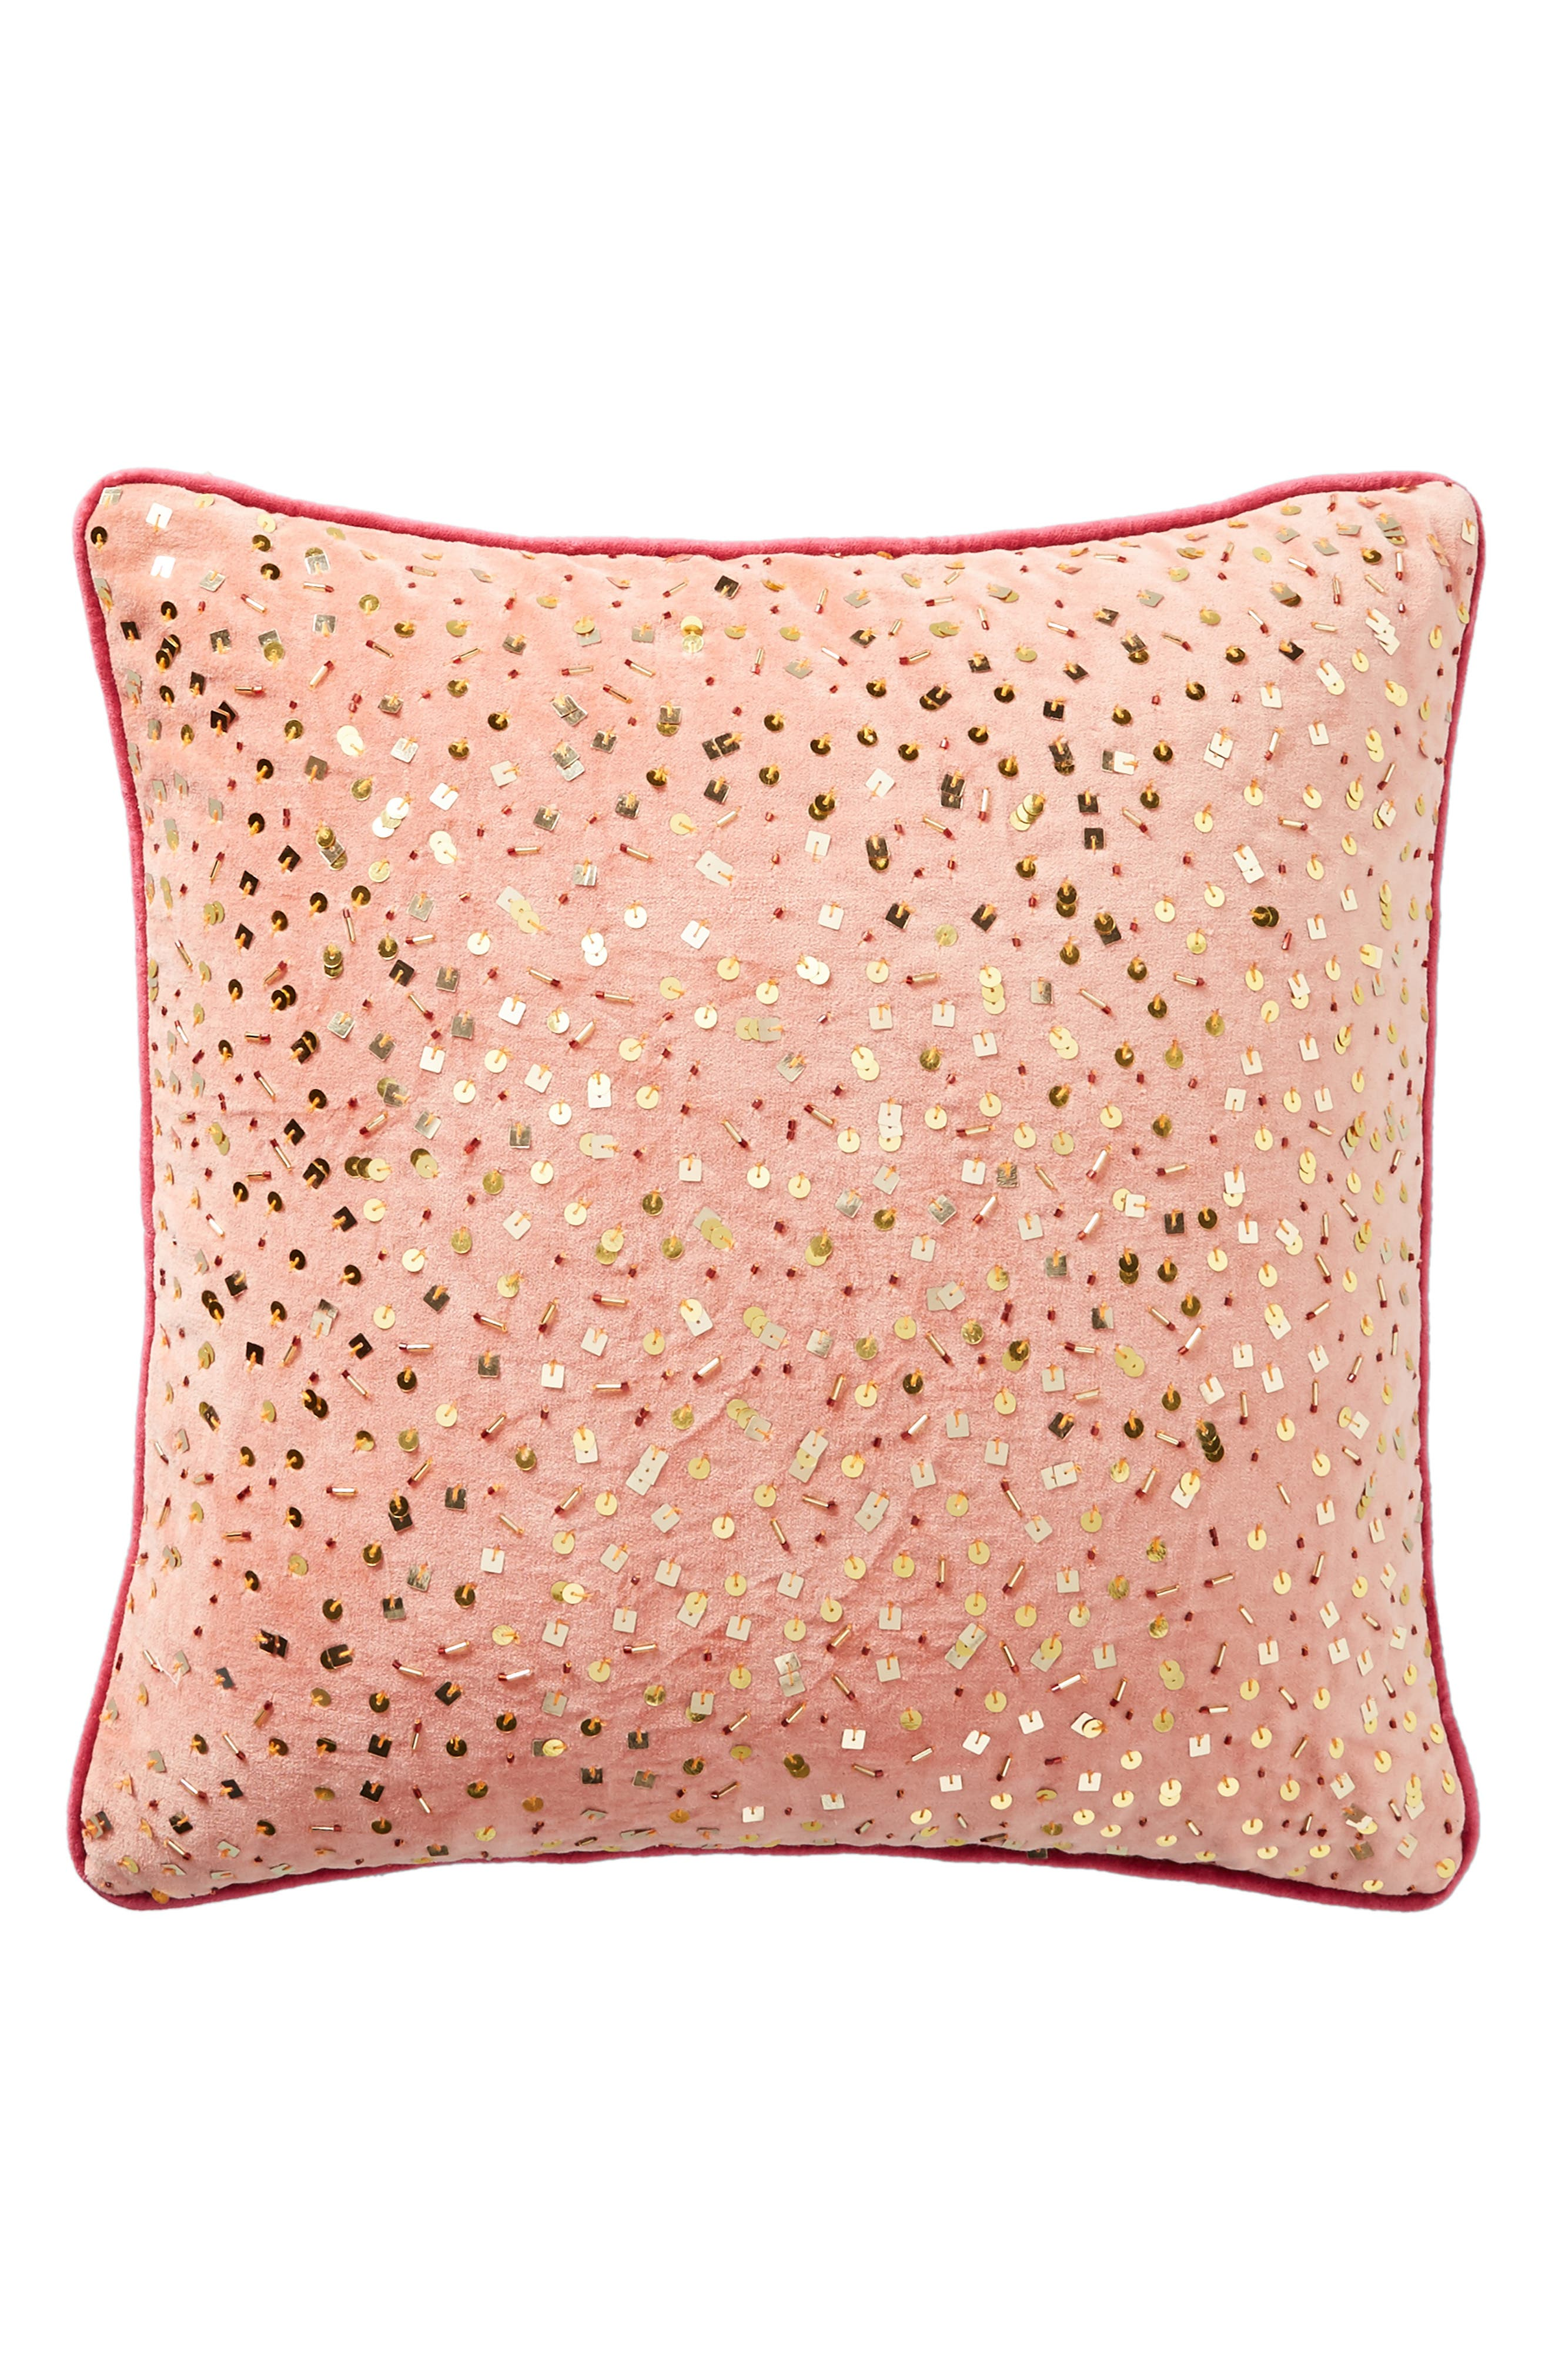 Confetti Velvet Accent Pillow,                             Alternate thumbnail 4, color,                             893